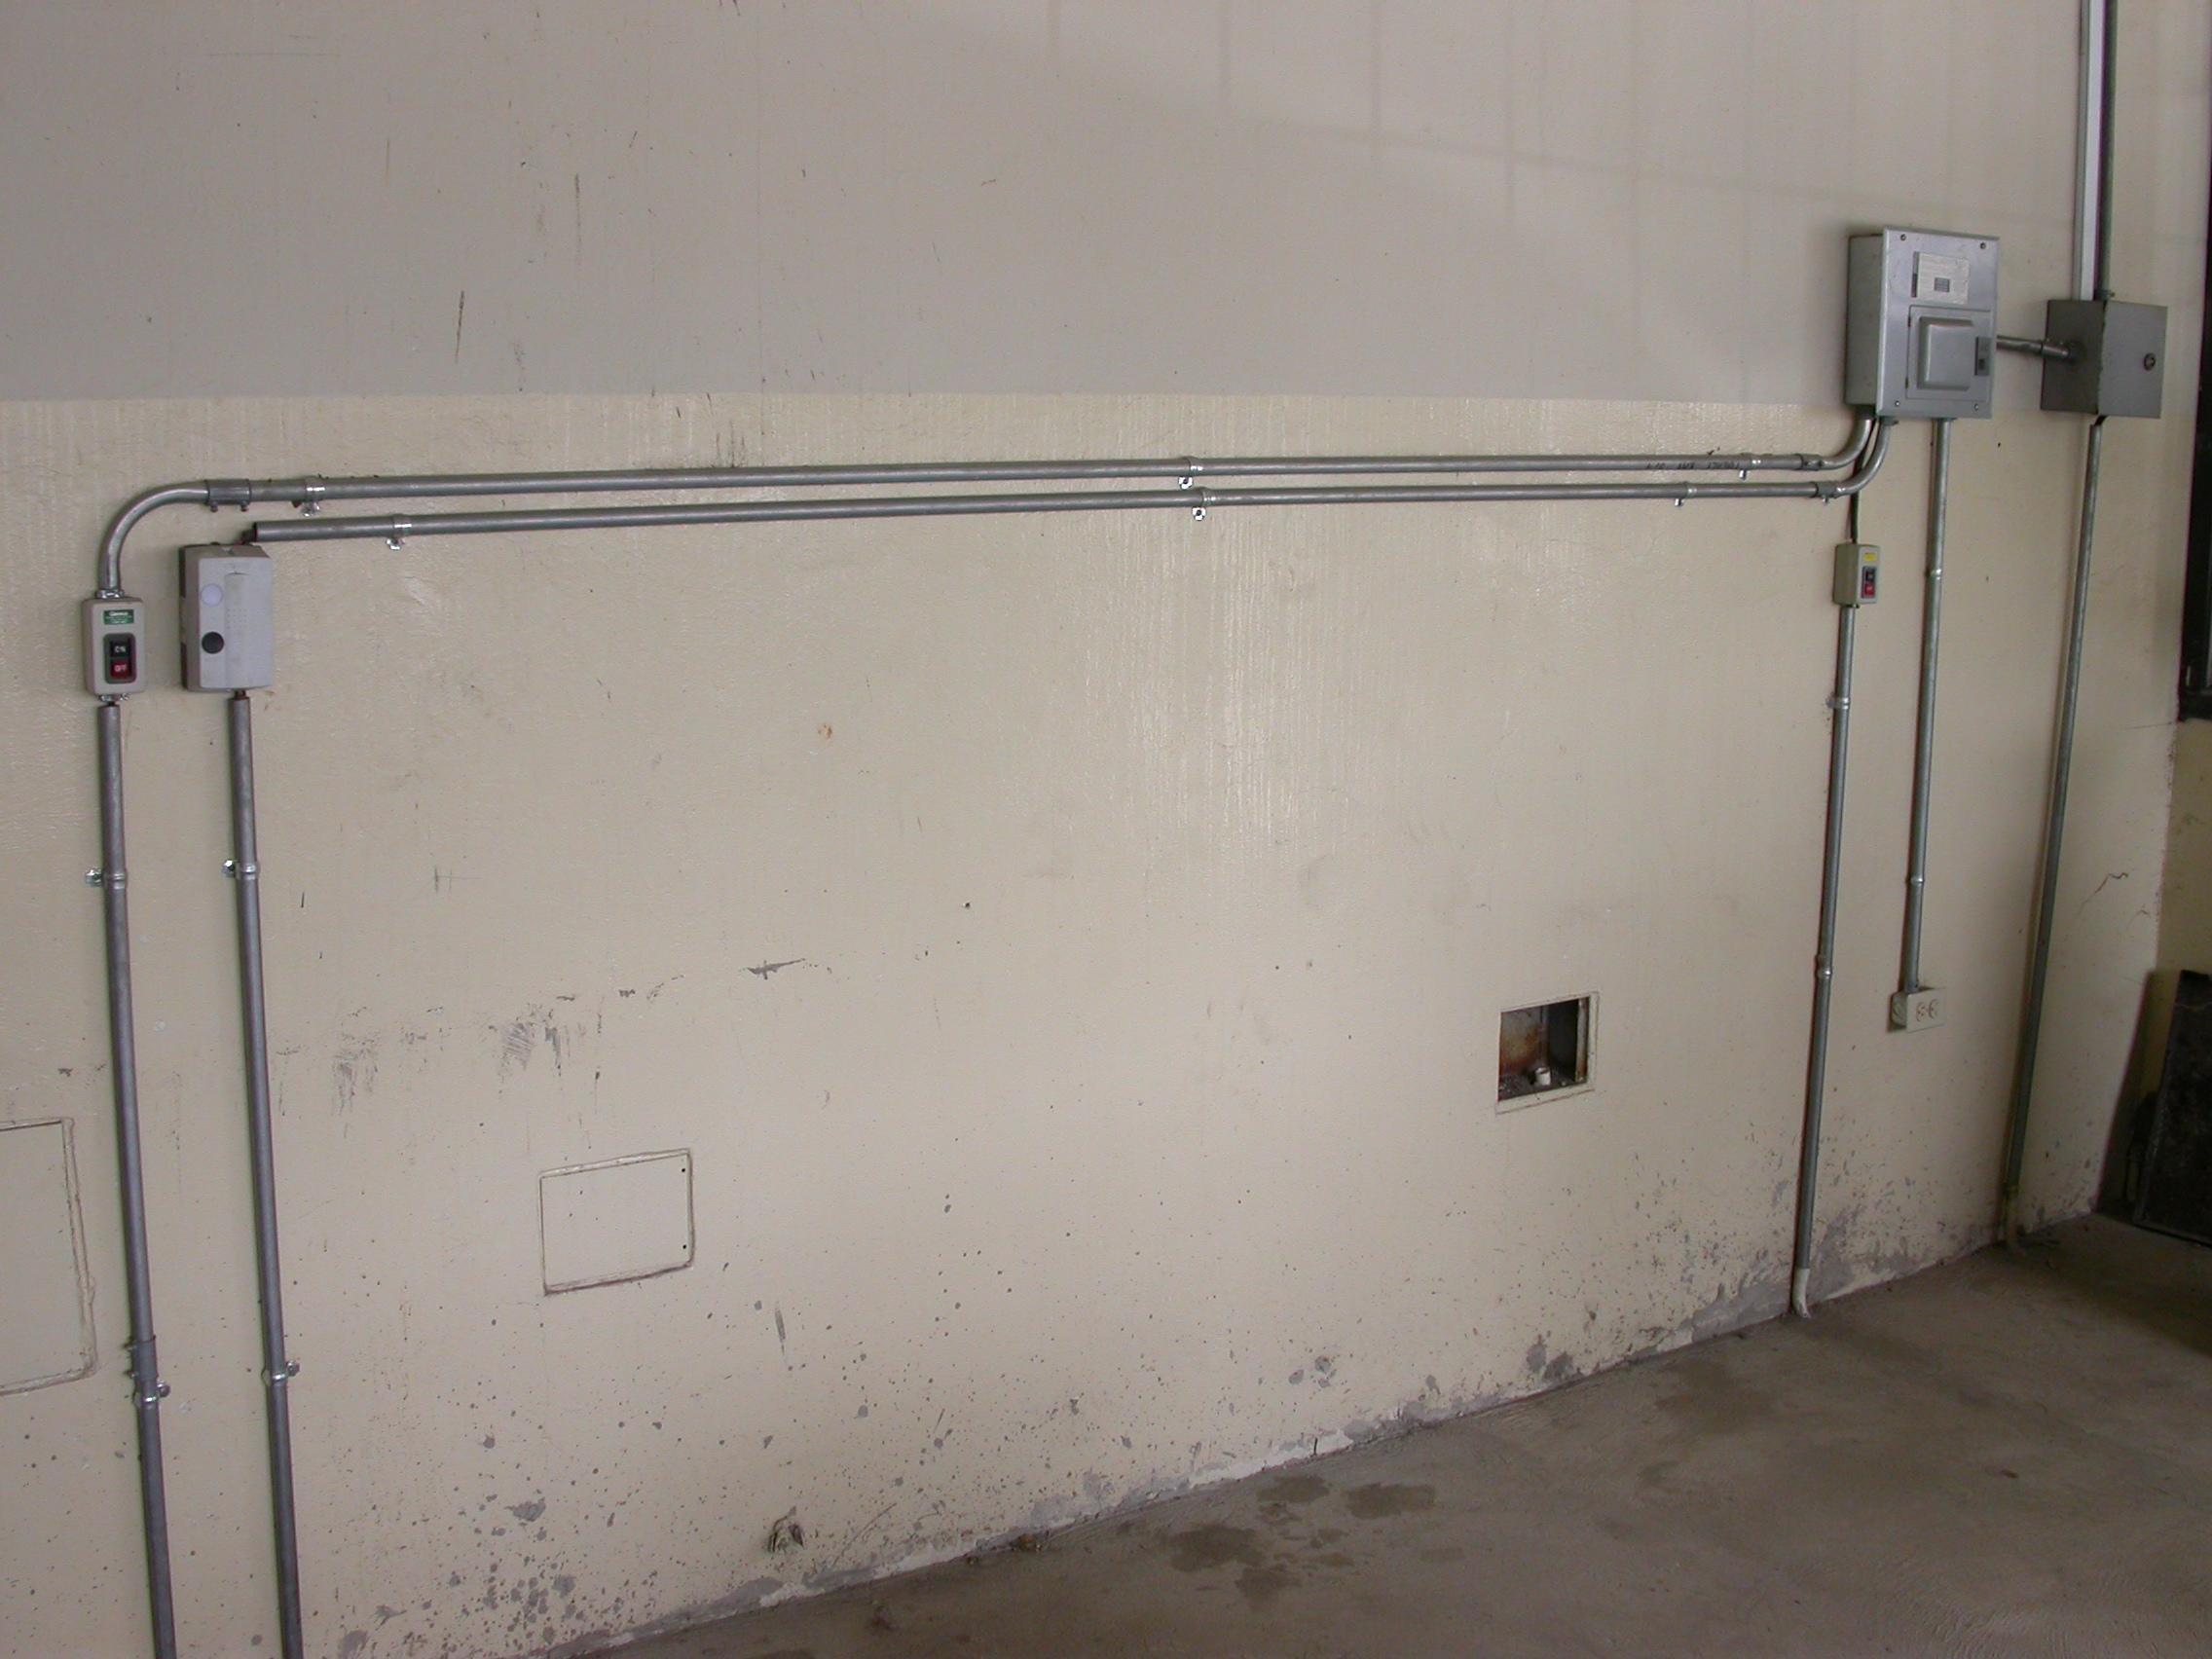 Dspace en espol creaci n de un laborator o para an lisis - Instalacion electrica superficie ...